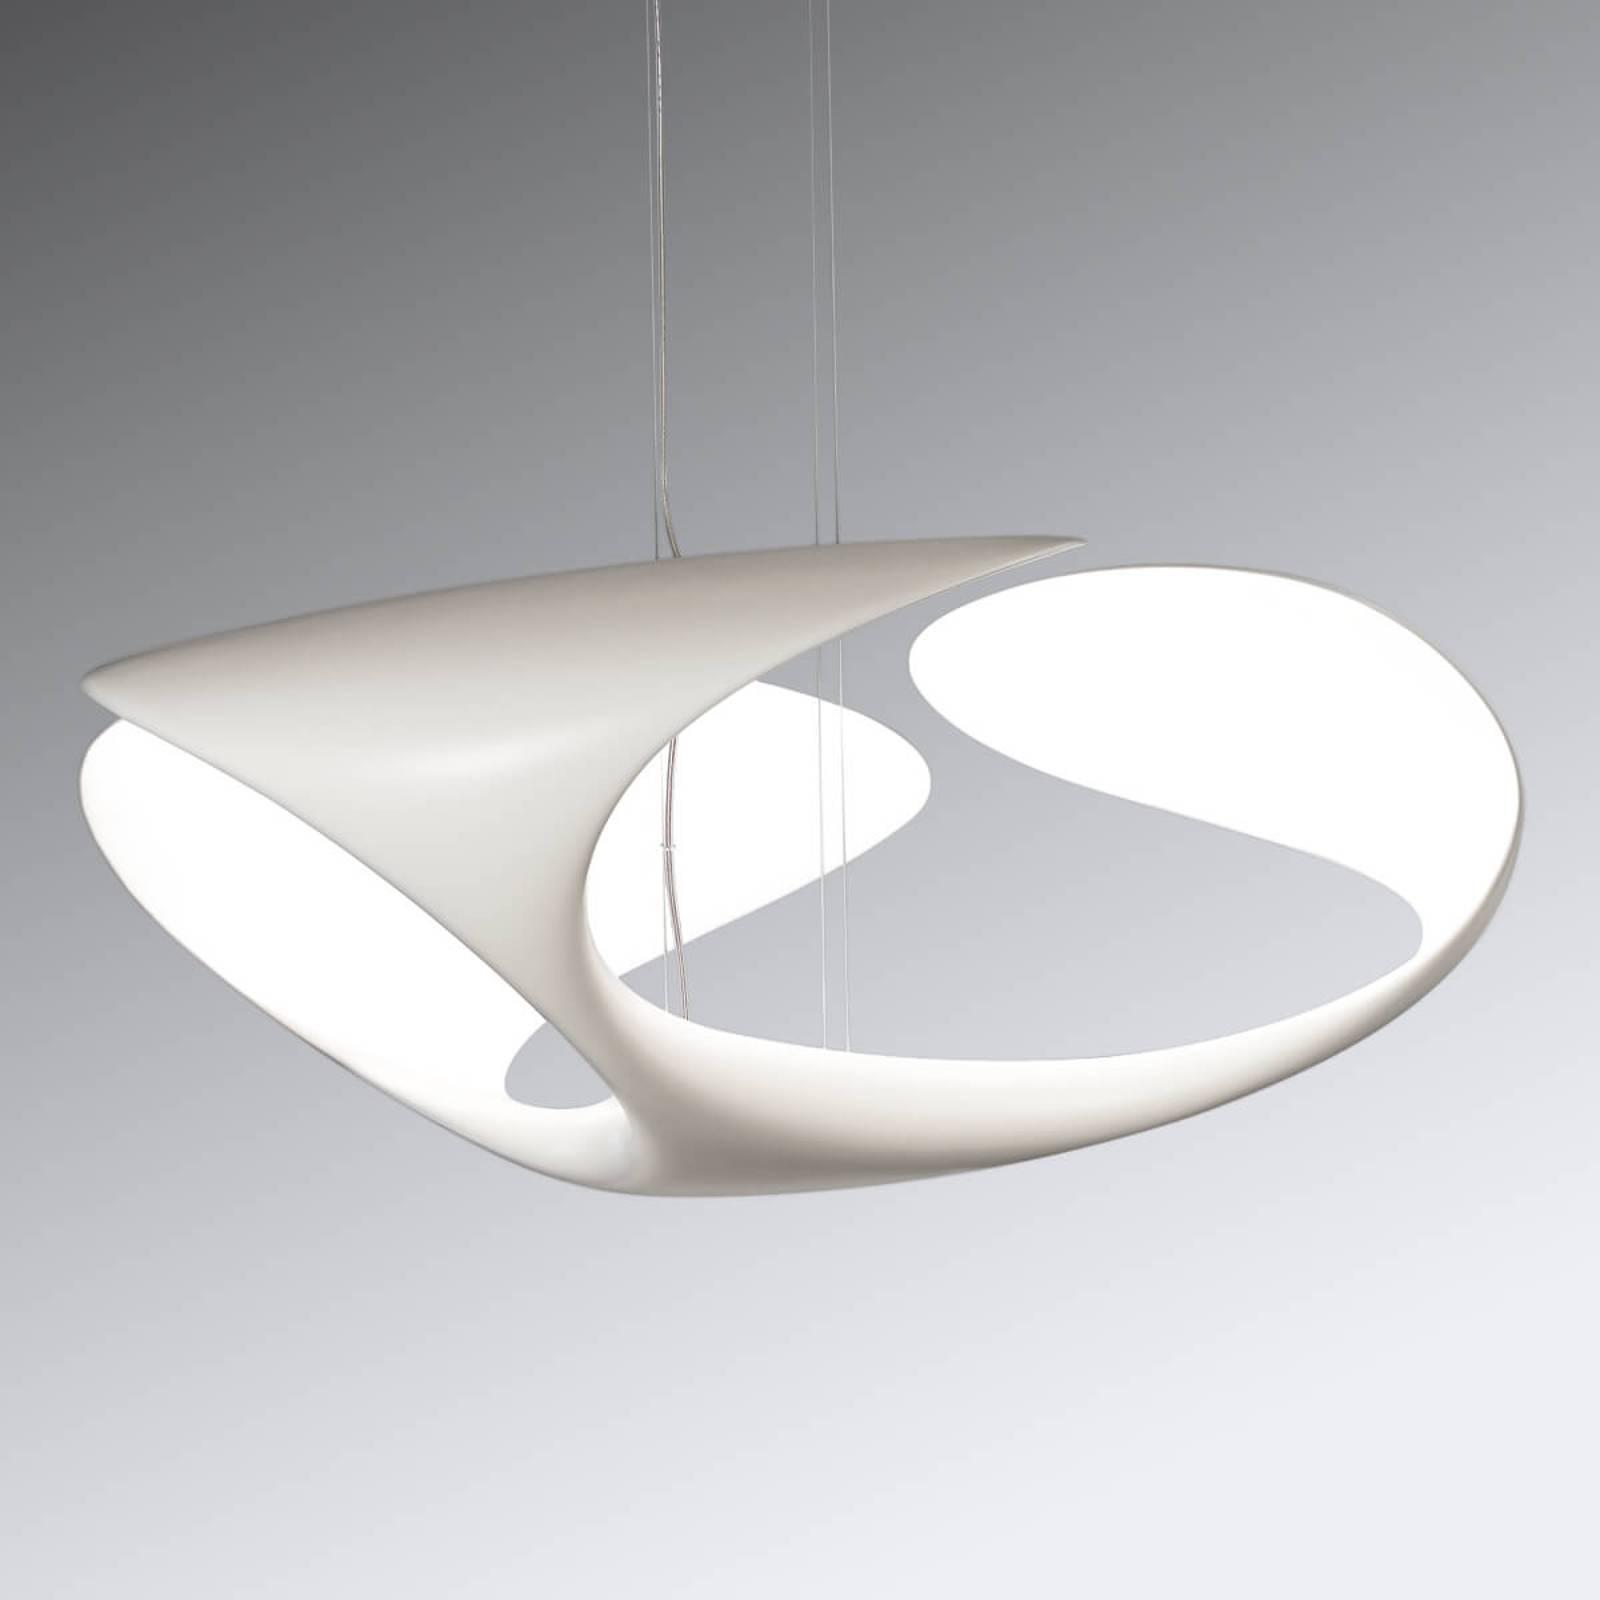 Suspension LED exclusive Clover